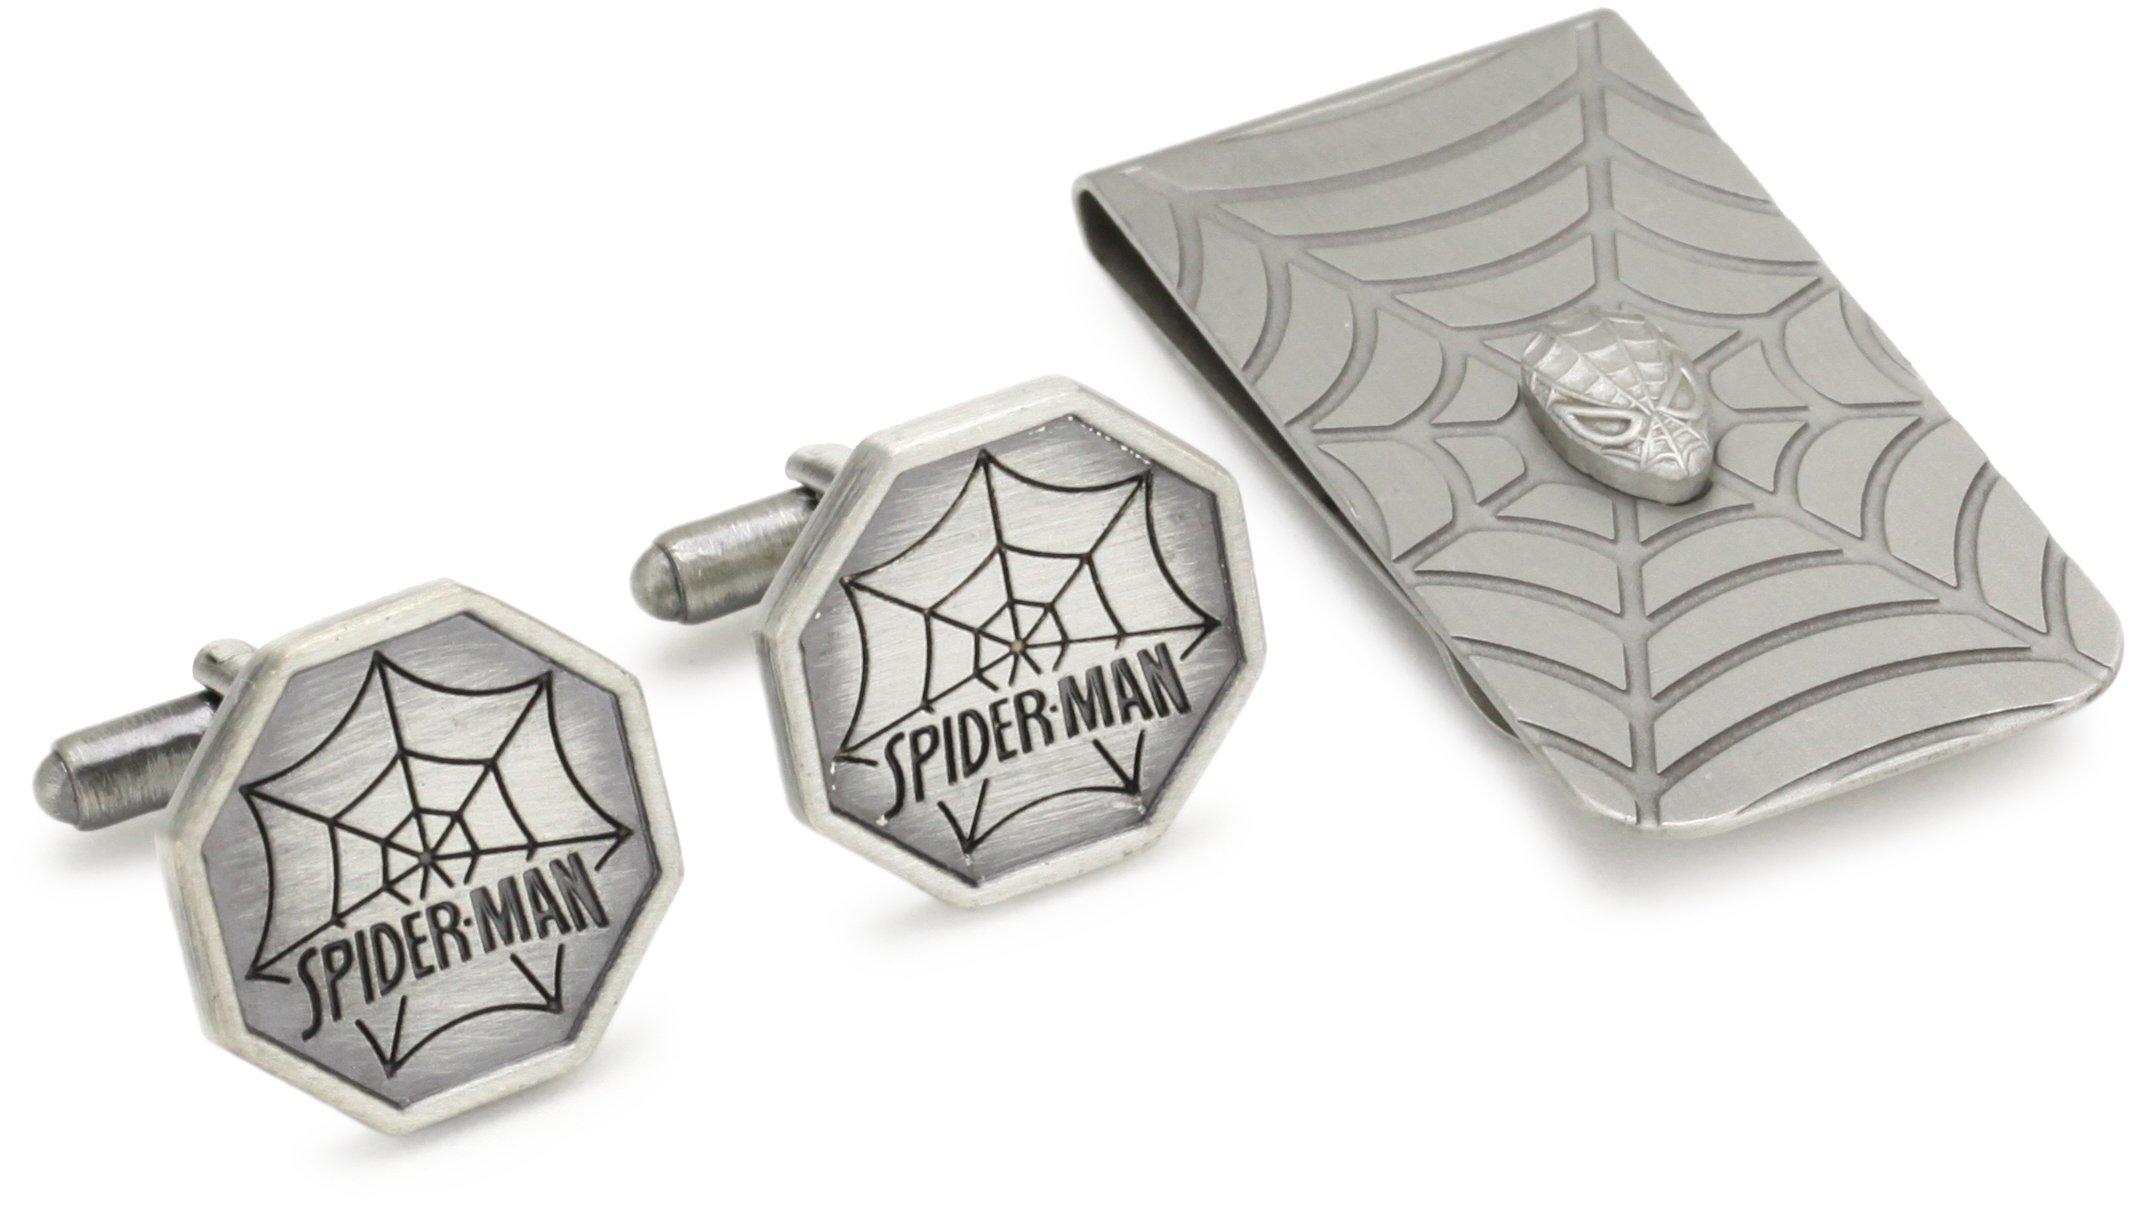 Marvel Comics Spider-Man Cuff Link and Money Clip Box Set